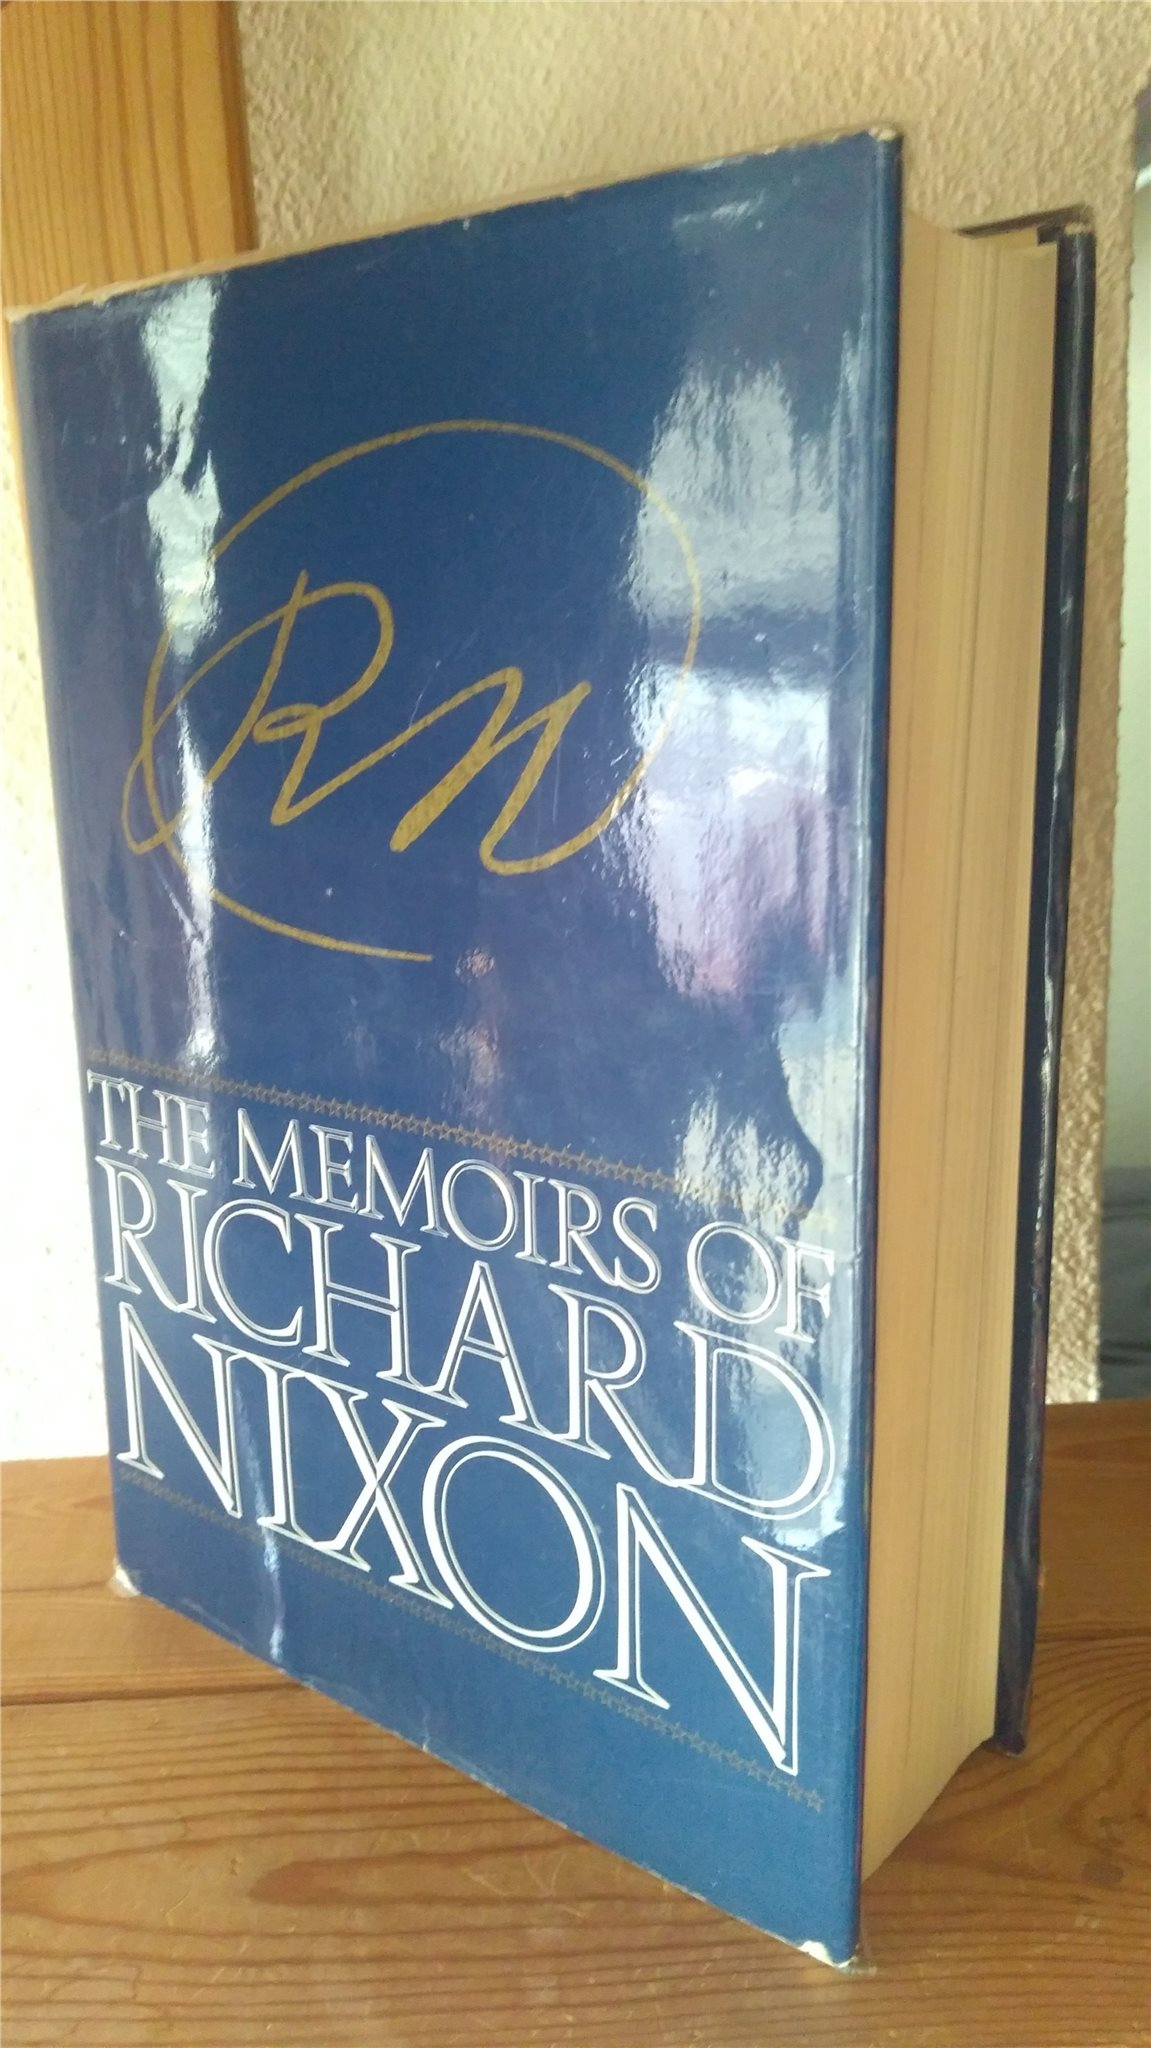 The memoirs of Richard Nixon, biografi, kalla kriget, historia, politik, Vietnam